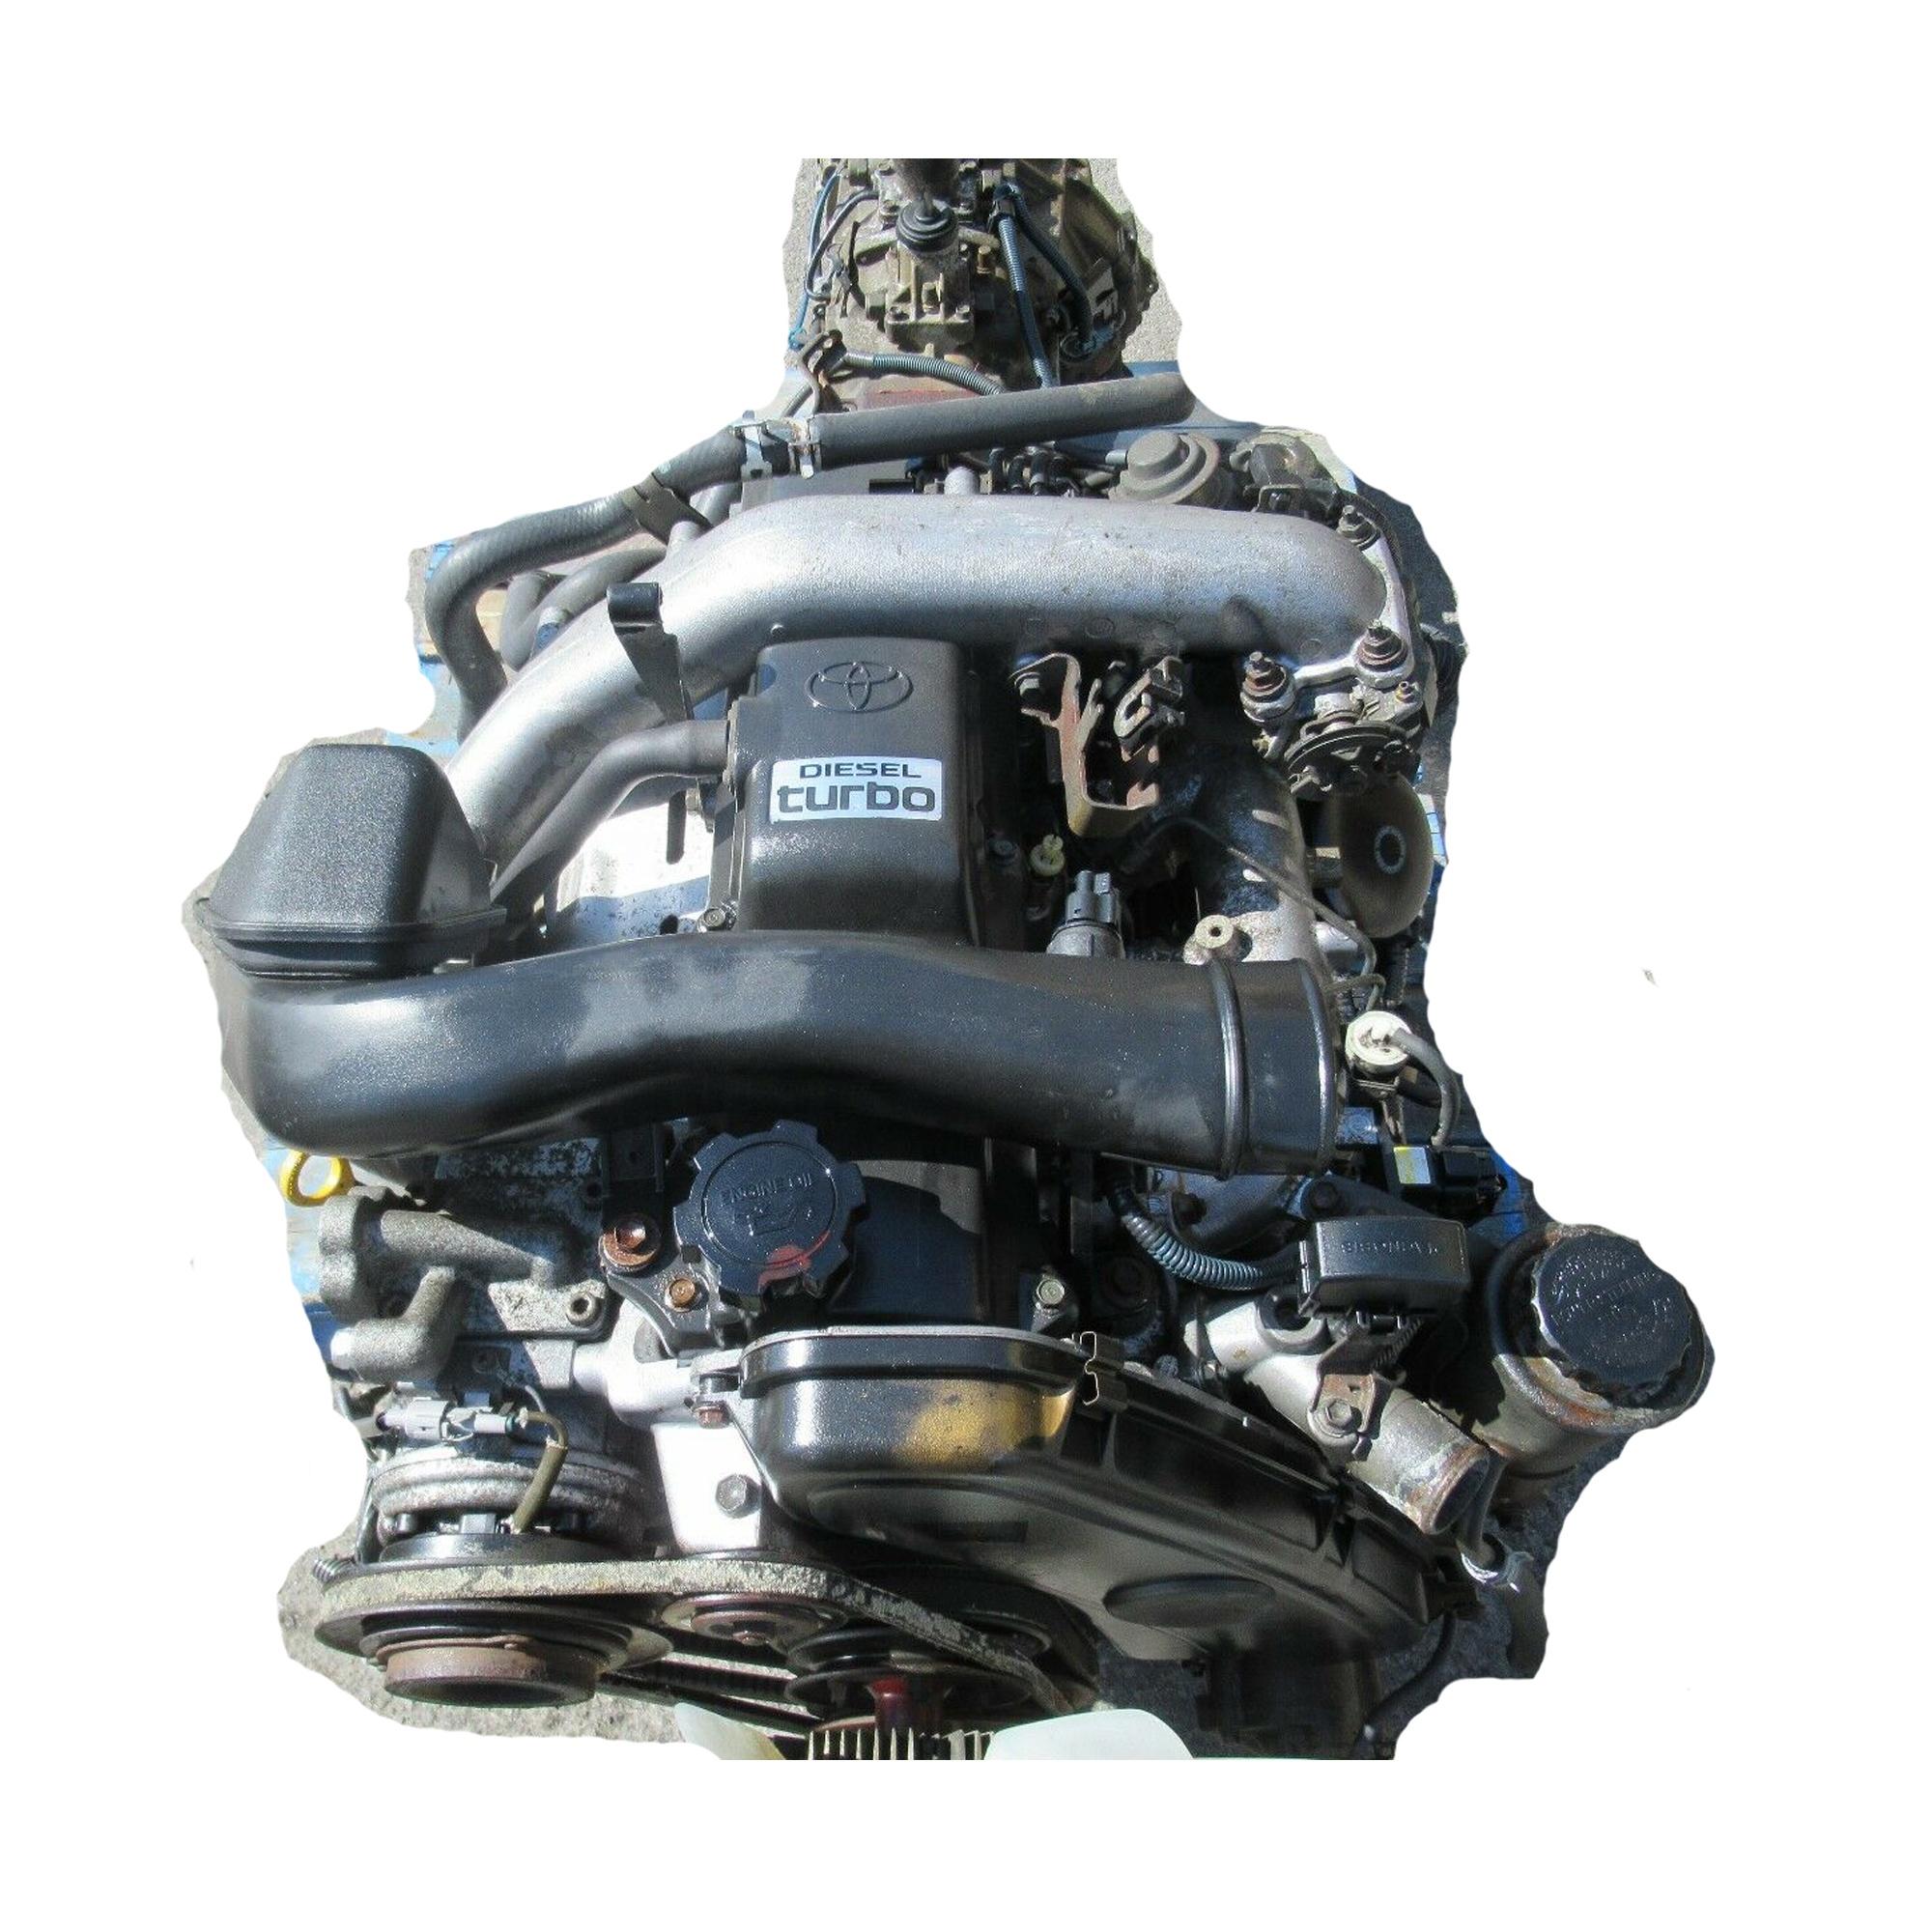 JDM ENGINE 1KZ /JAPAN MOTORES USADOS / JAPAN USED ENGINE